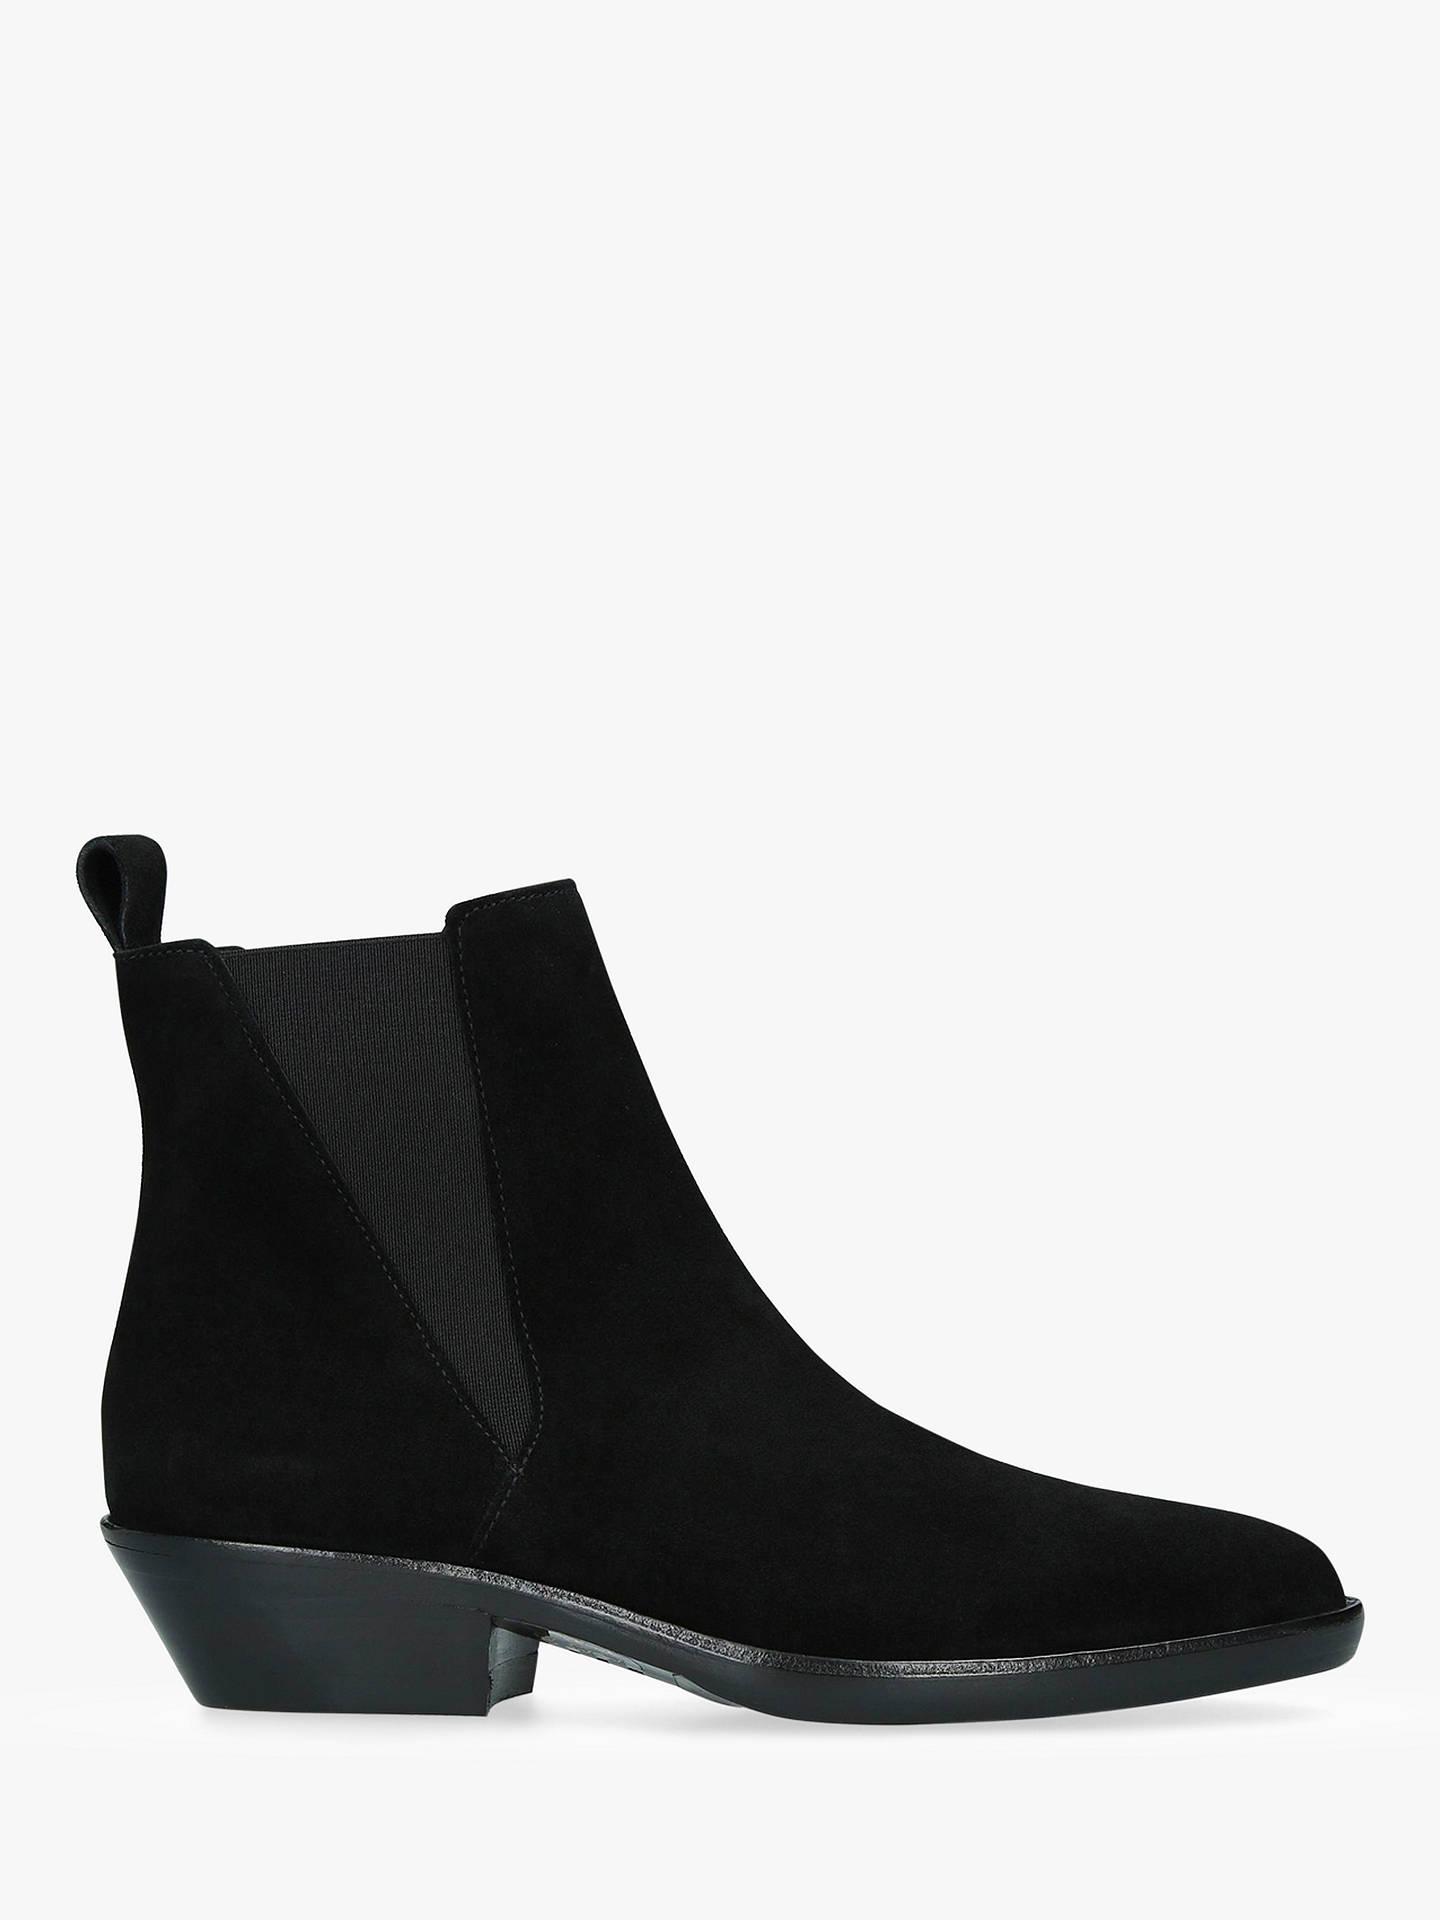 separation shoes 484d6 2c080 Isabel Marant Drenky Pull On Block Heel Ankle Boots, Black ...